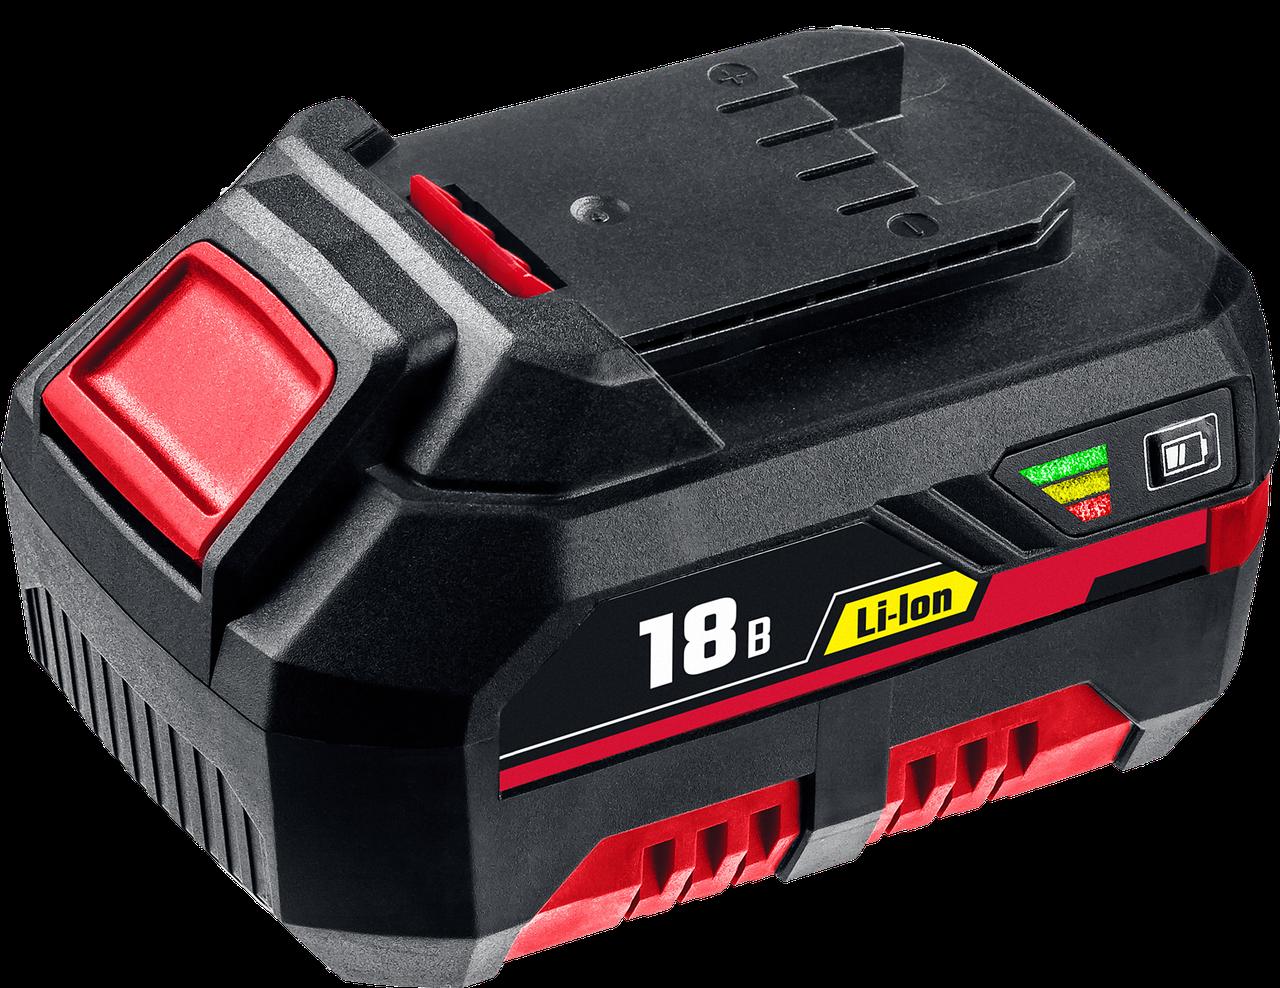 Аккумуляторная батарея для шуруповерта, Li-Ion, 18 В, C1 АКБ-18-3 С1, серия «СТАНДАРТ» ЗУБР